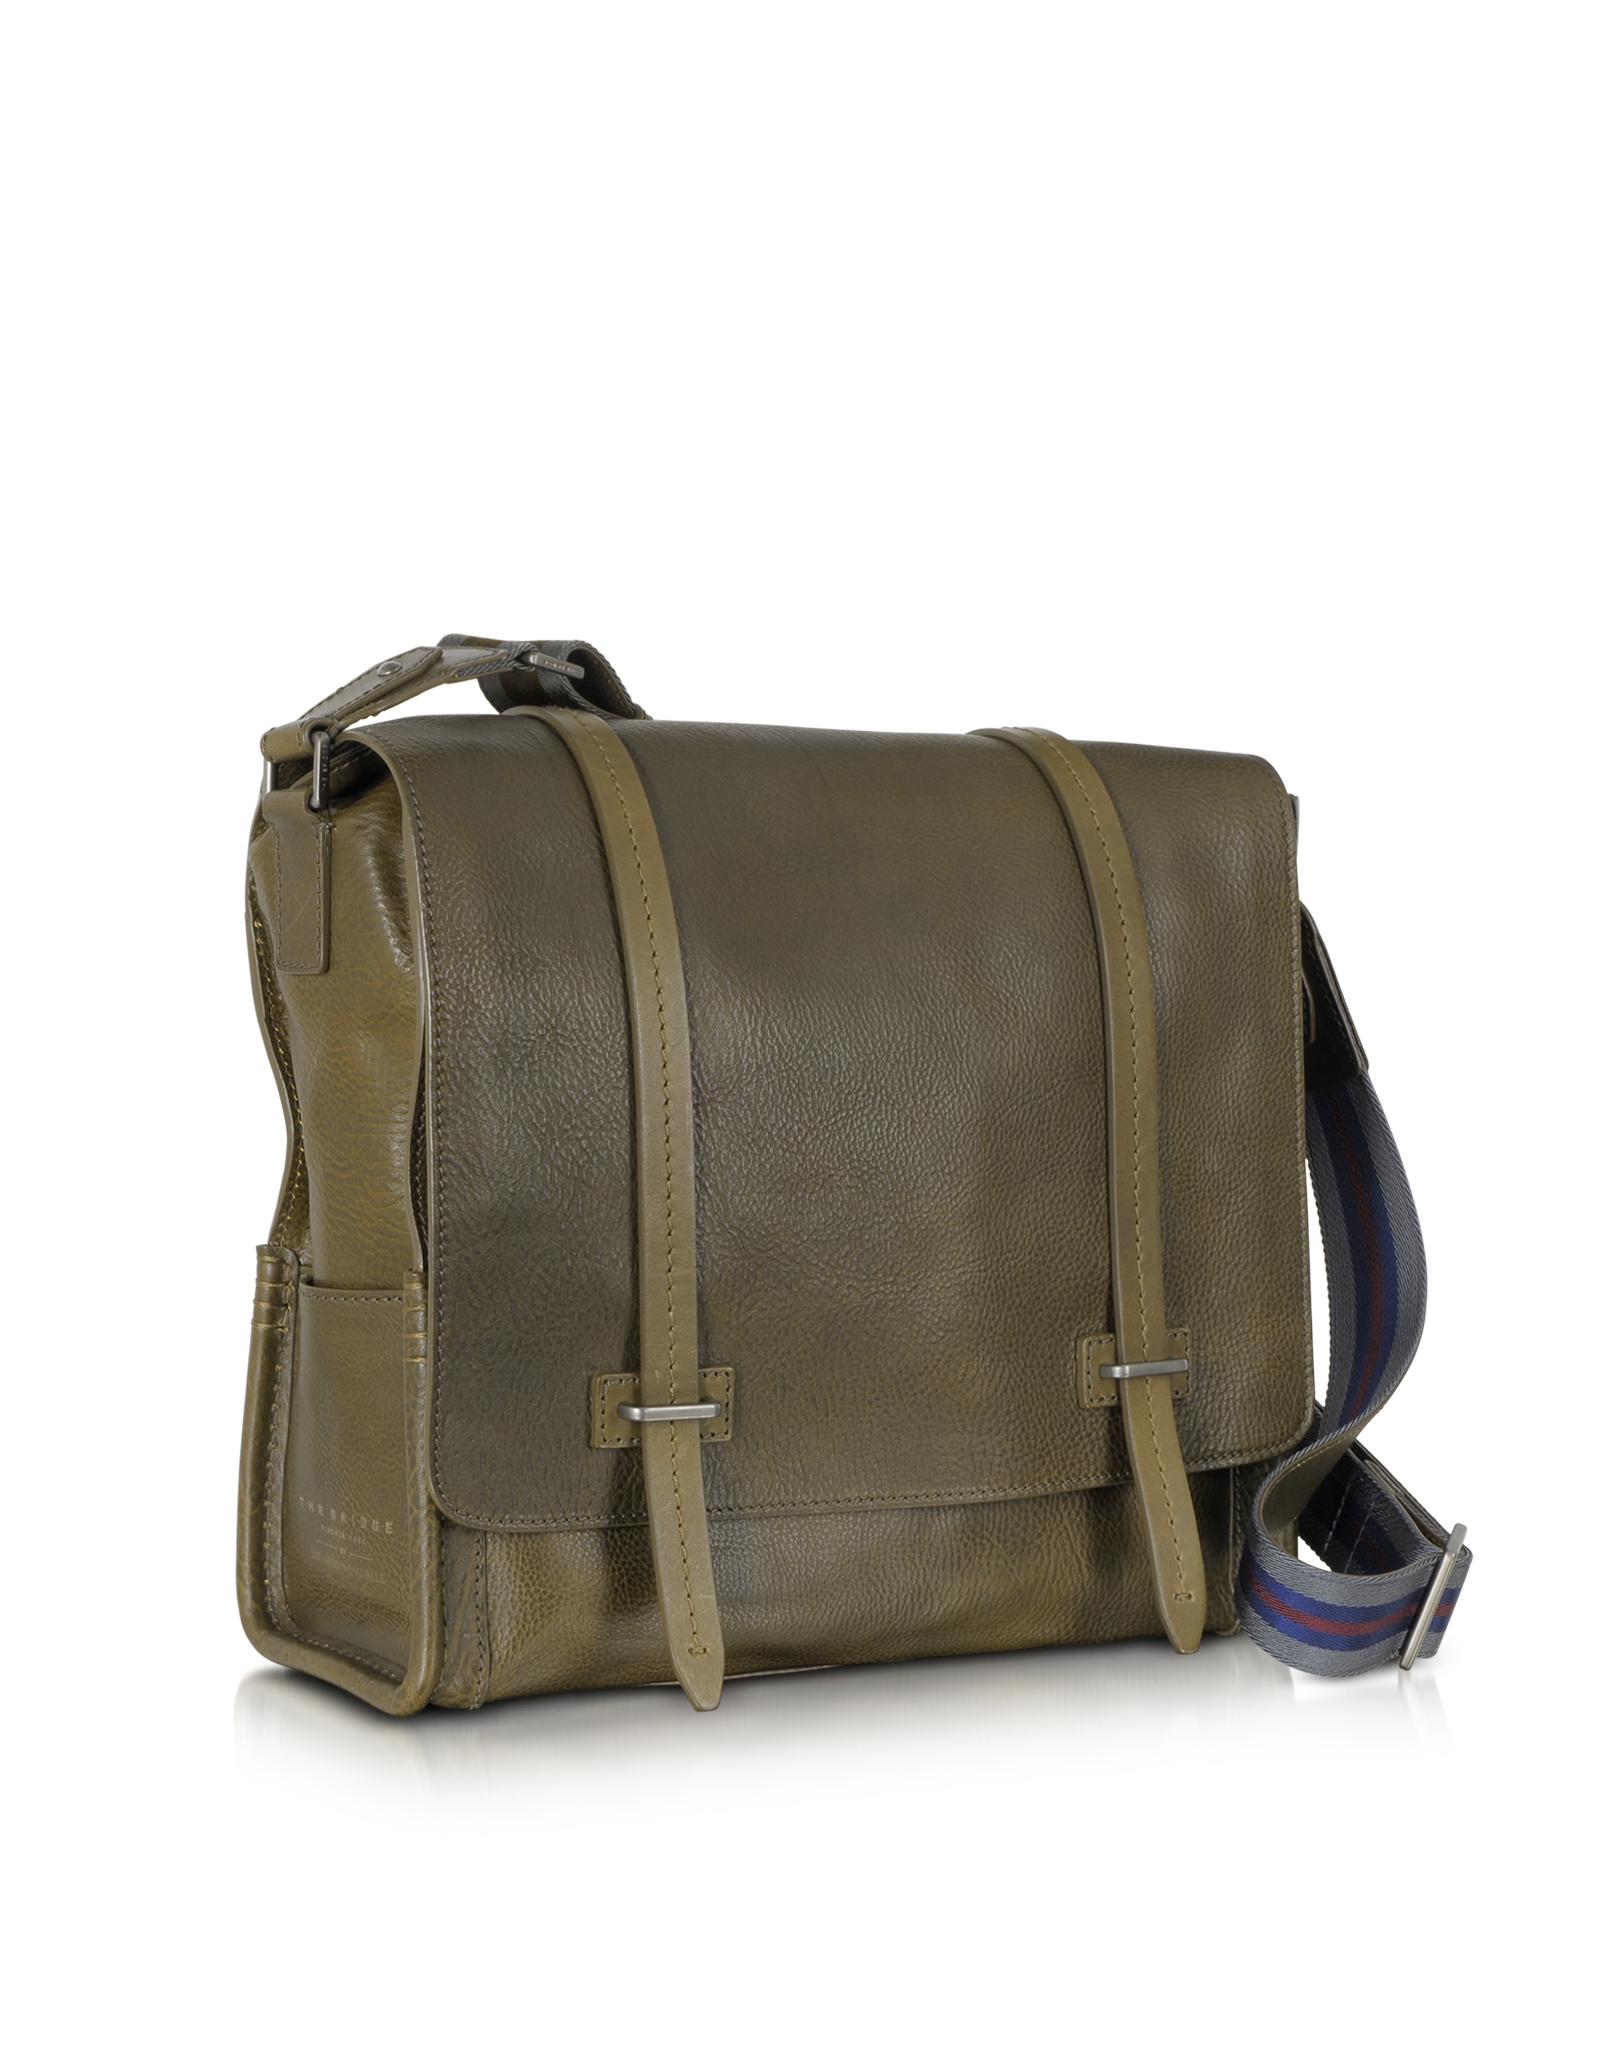 e49553251316 Lyst - The Bridge Ascott Large Olive Green Leather Messenger Bag in ...